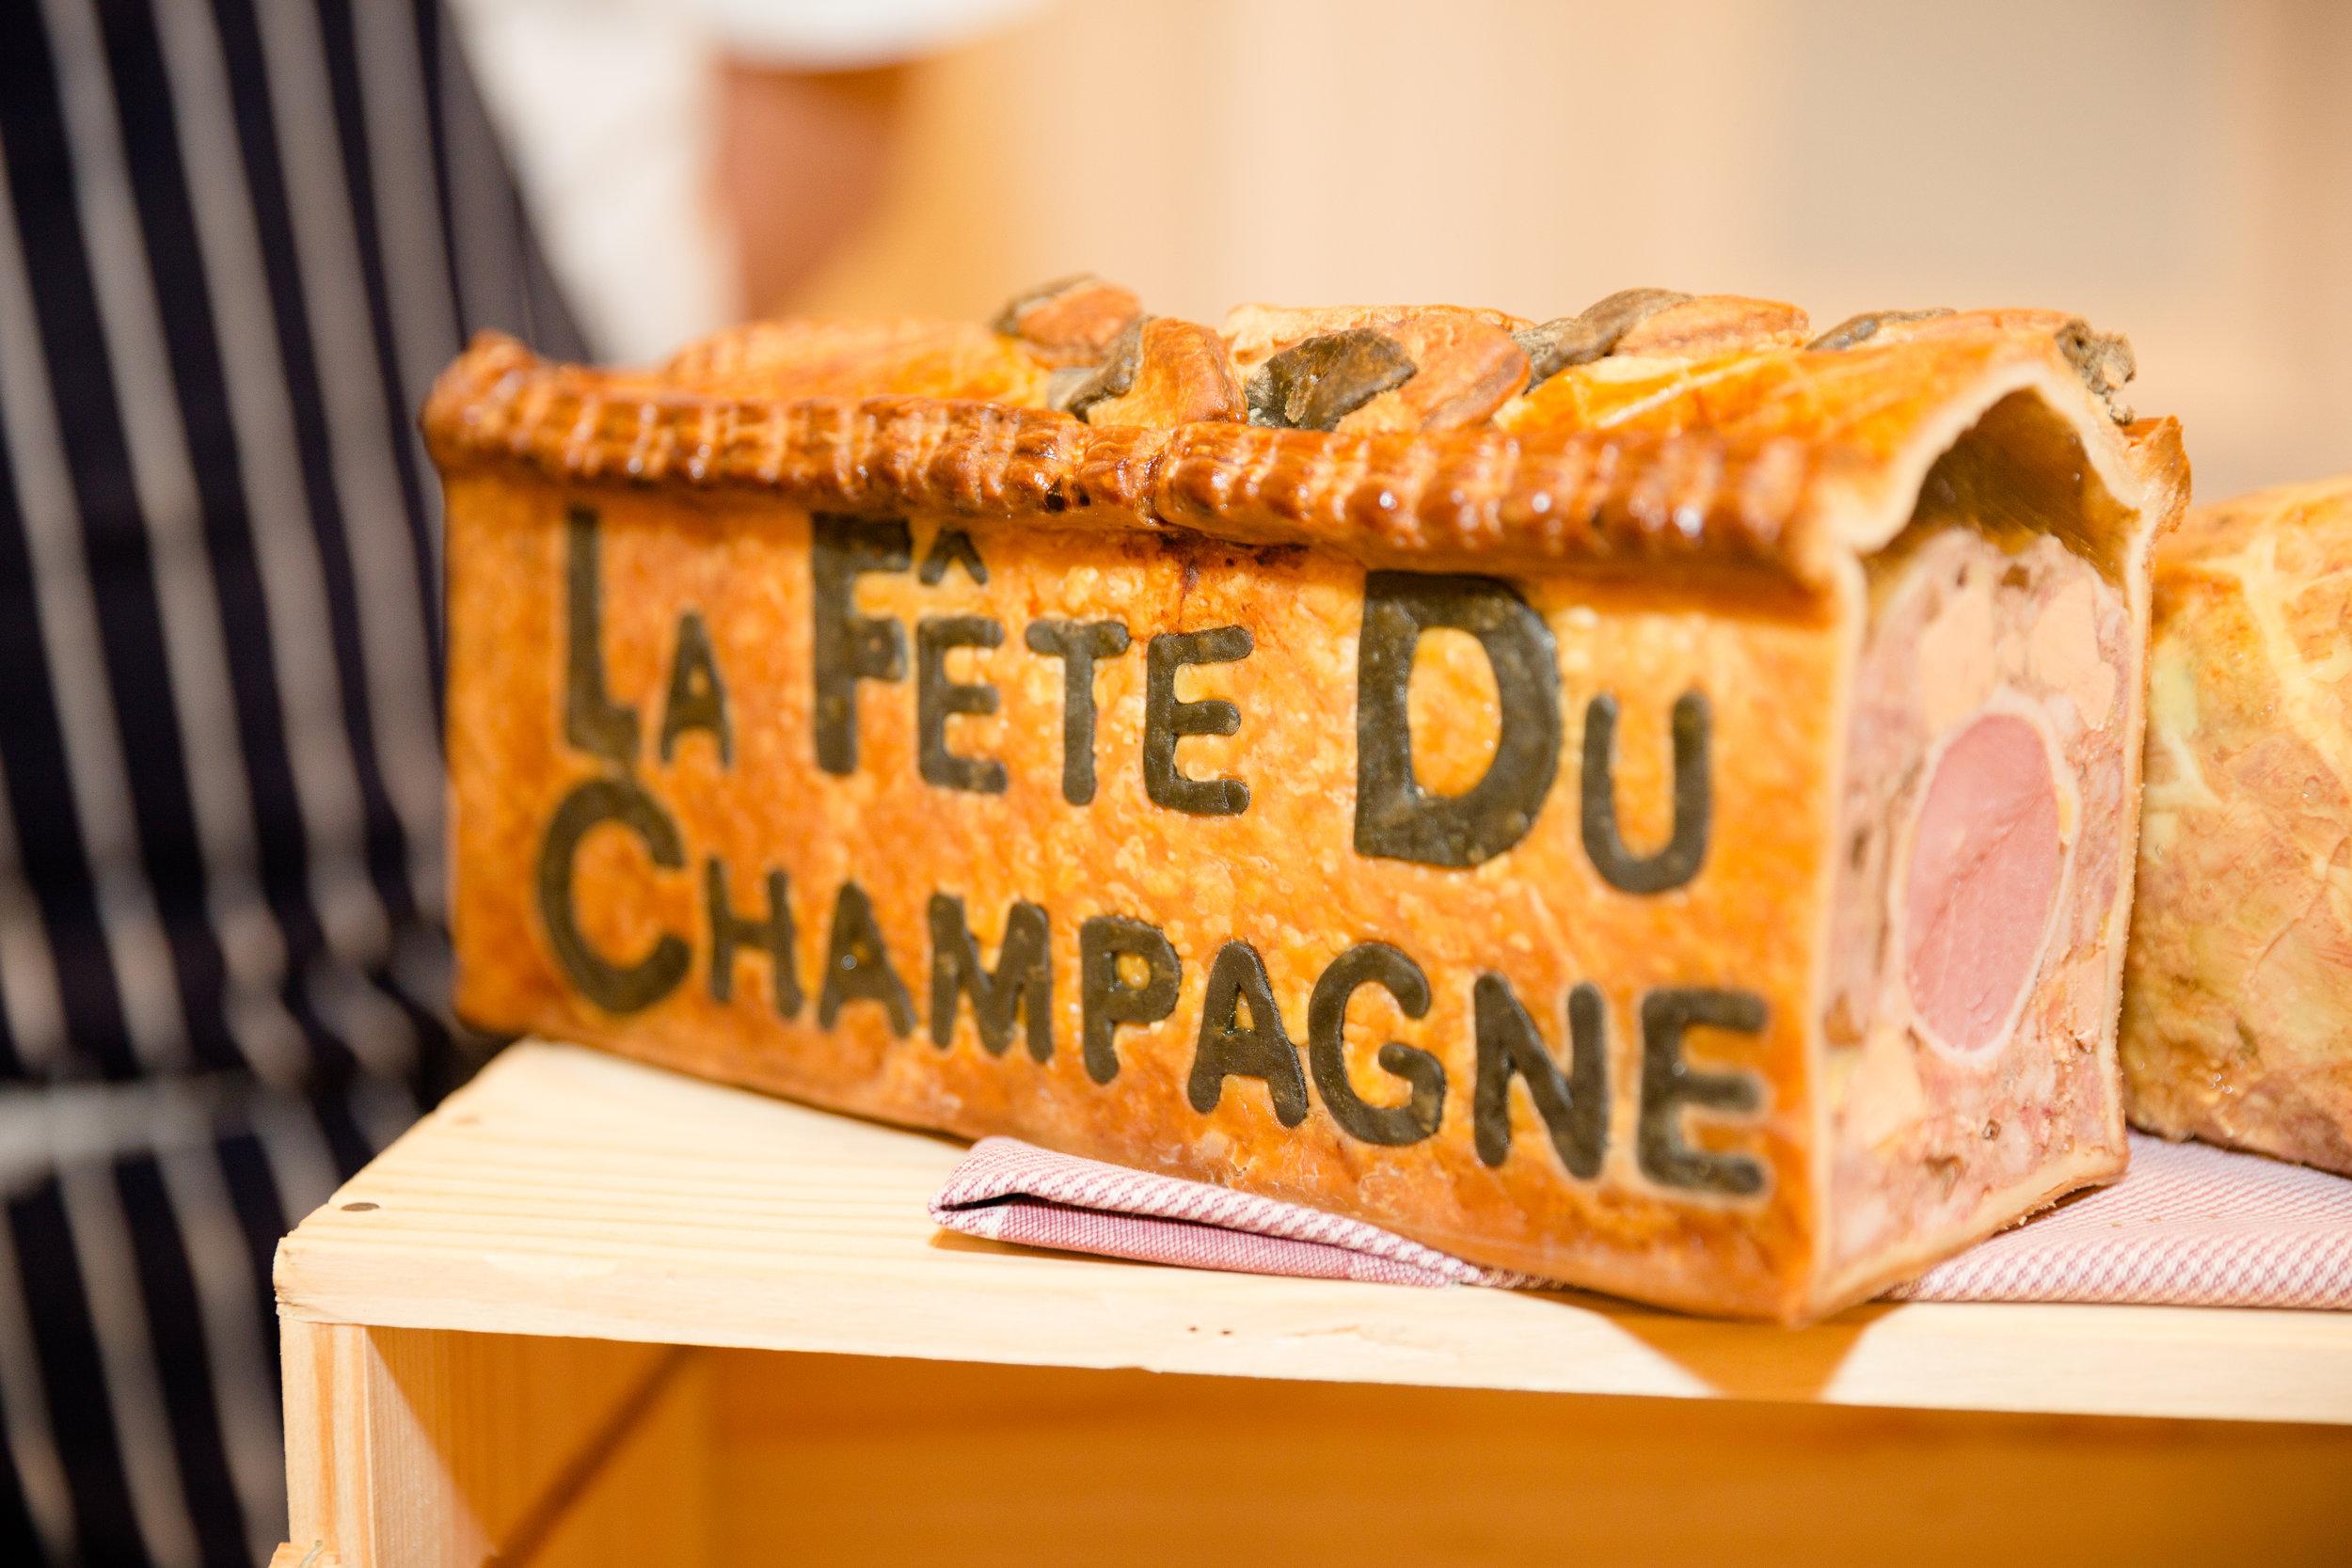 Copy of Le Fete Day Event Nov 2017-185.jpg